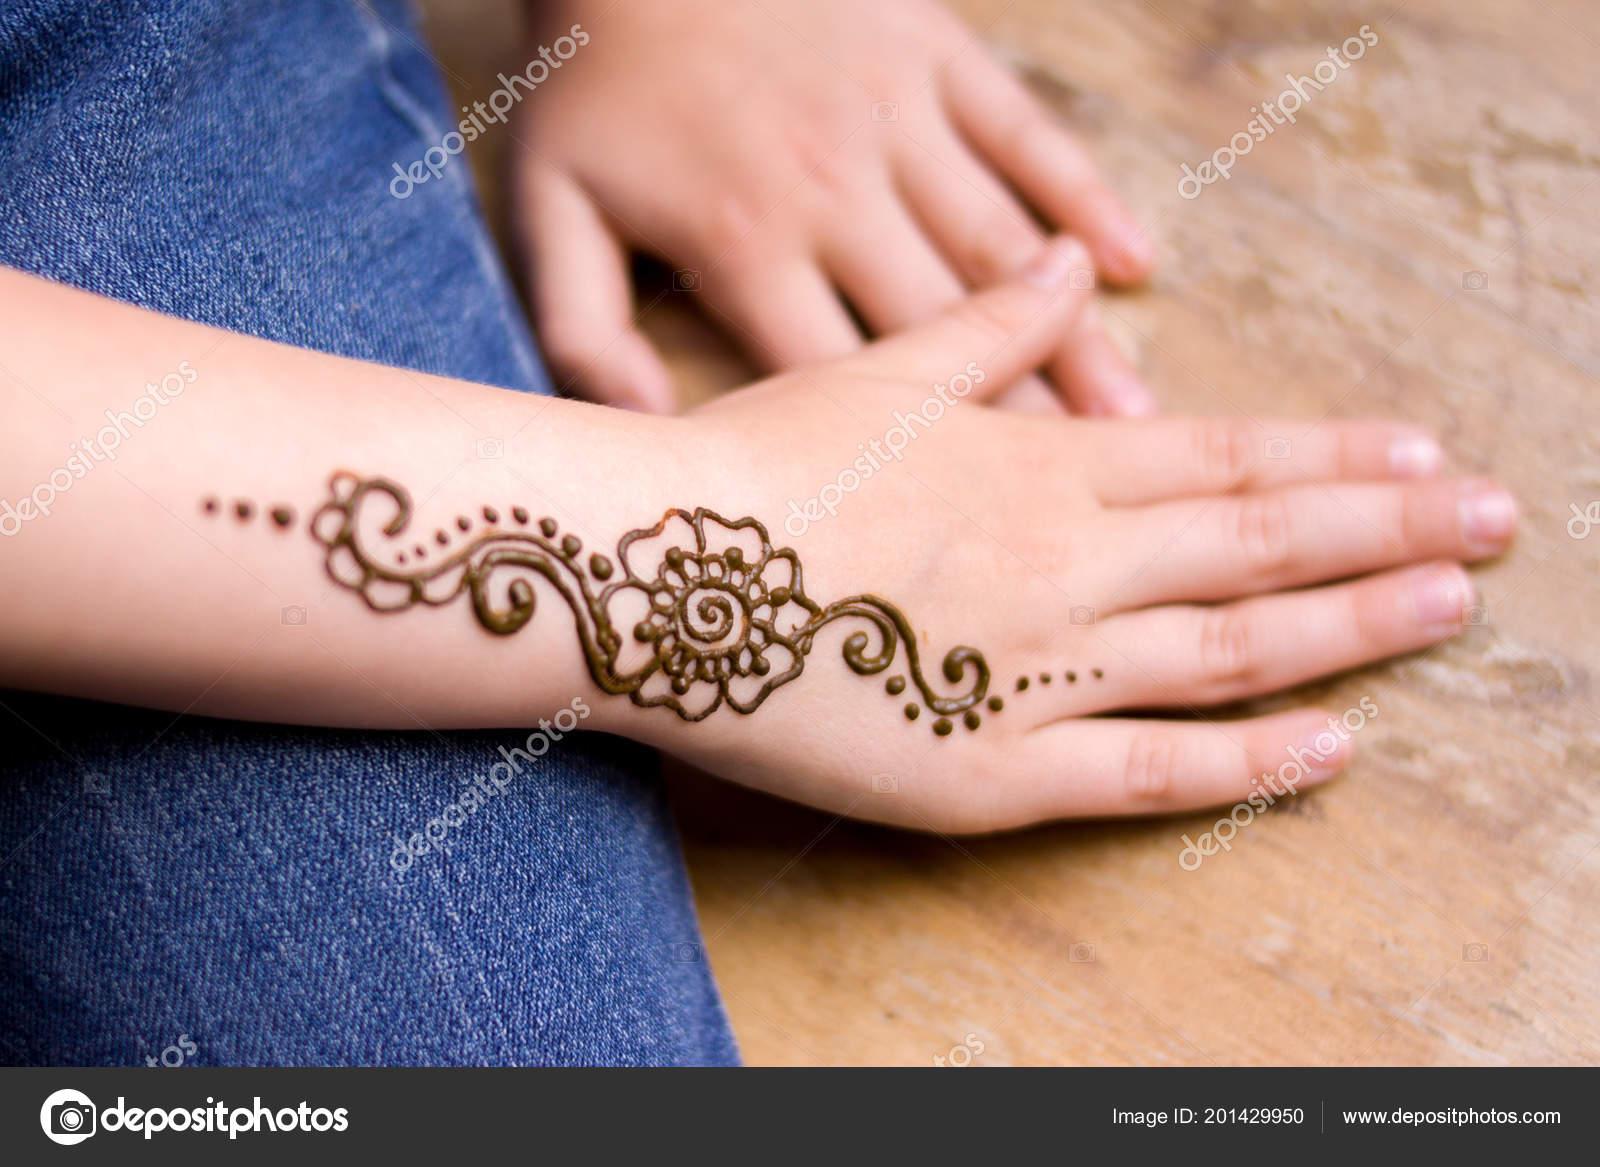 Beauty Concept Henna Tattoo Small Girl Hand Mehndi